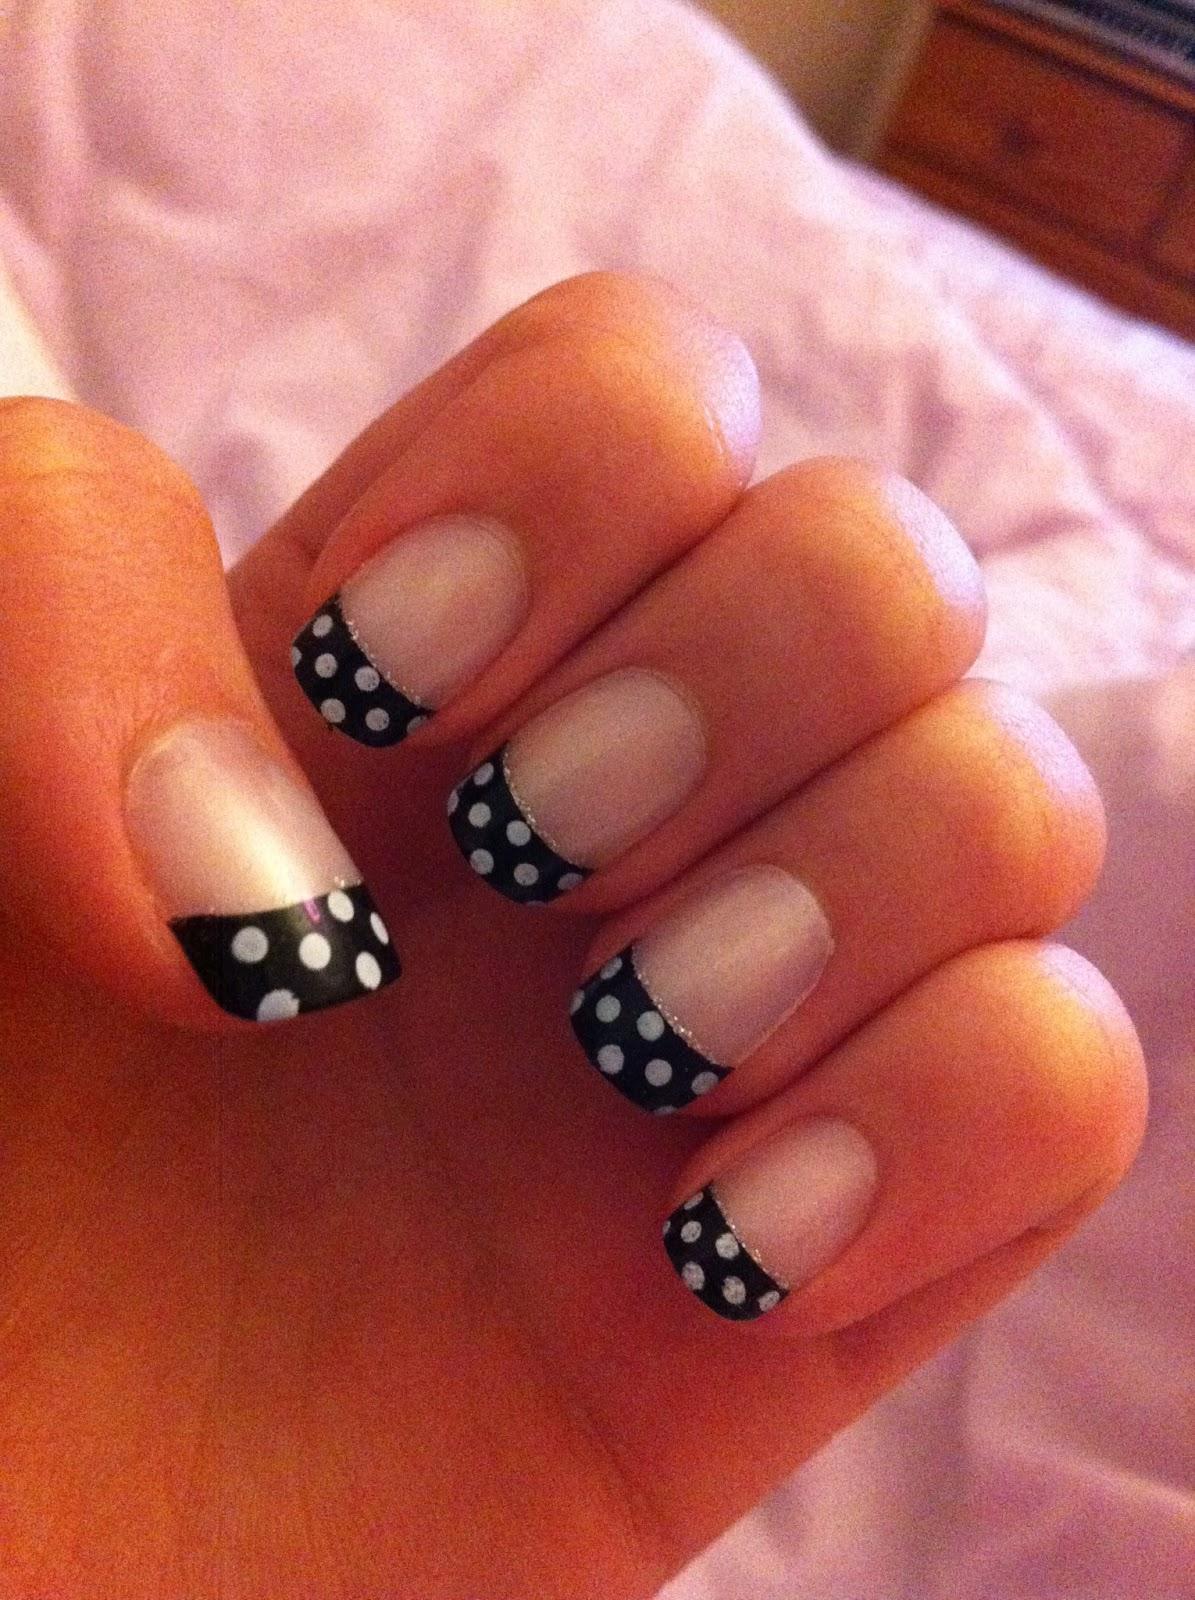 Fashion Nails Spa Mentor Home: Laurenlovesmakeup'xoxo: Primark Pound Fashion Nails